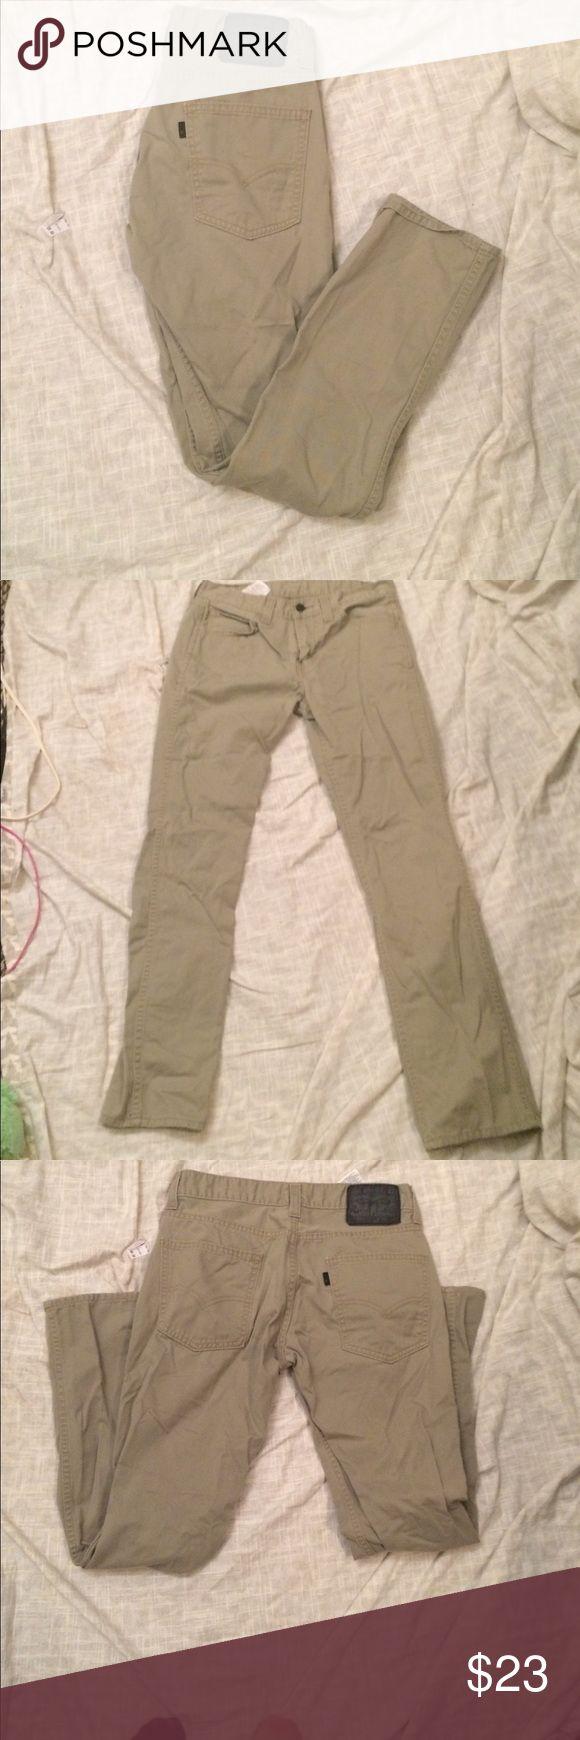 Men's Levi jeans 29x30 Khaki straight legged jeans from Levi's. Men's size 29x30! Good shape Levi's Jeans Straight